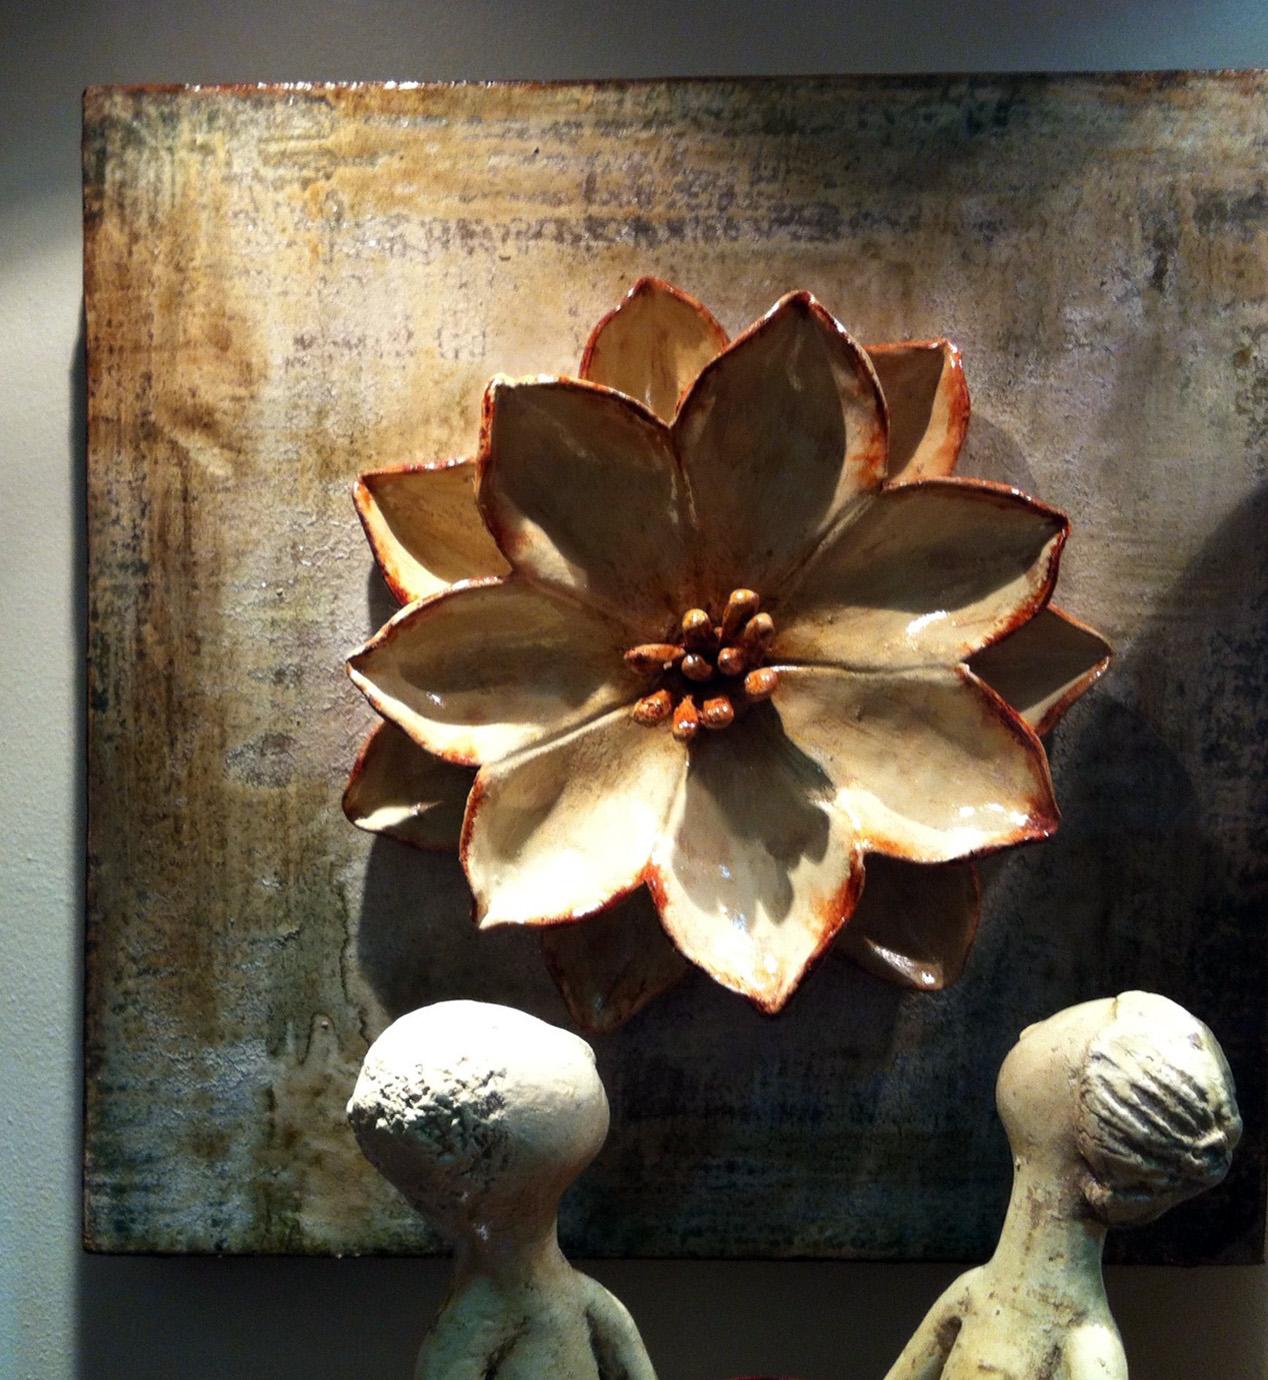 Mexican Artisans Bring New Home Decor to Atlanta Design and Wholesale Market